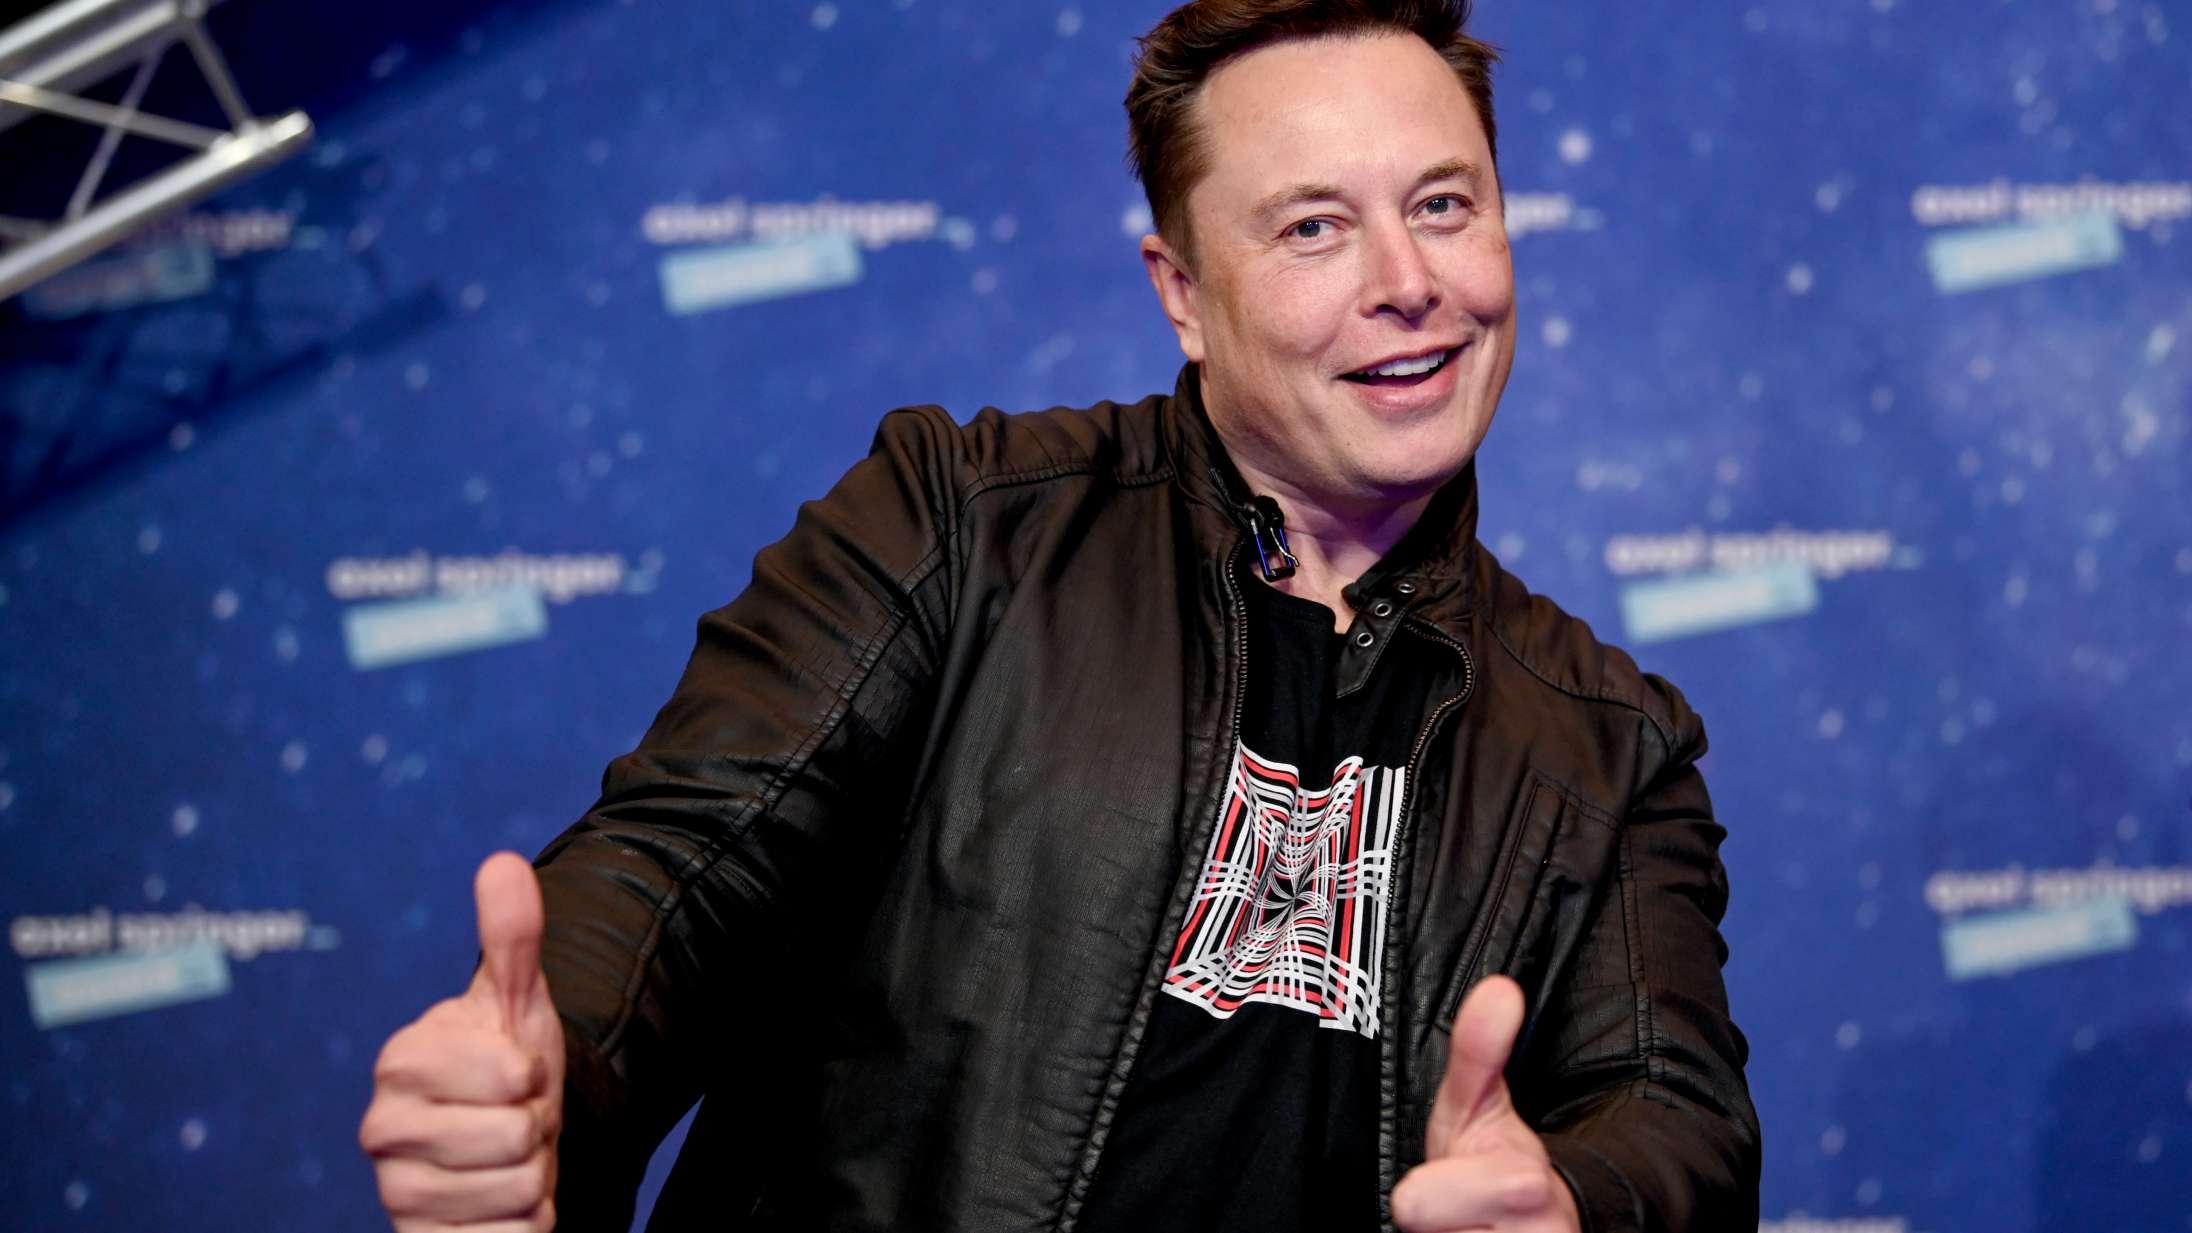 Elon Musks Neuralink har fået en abe til at spille 'Pong' ved tankens kraft